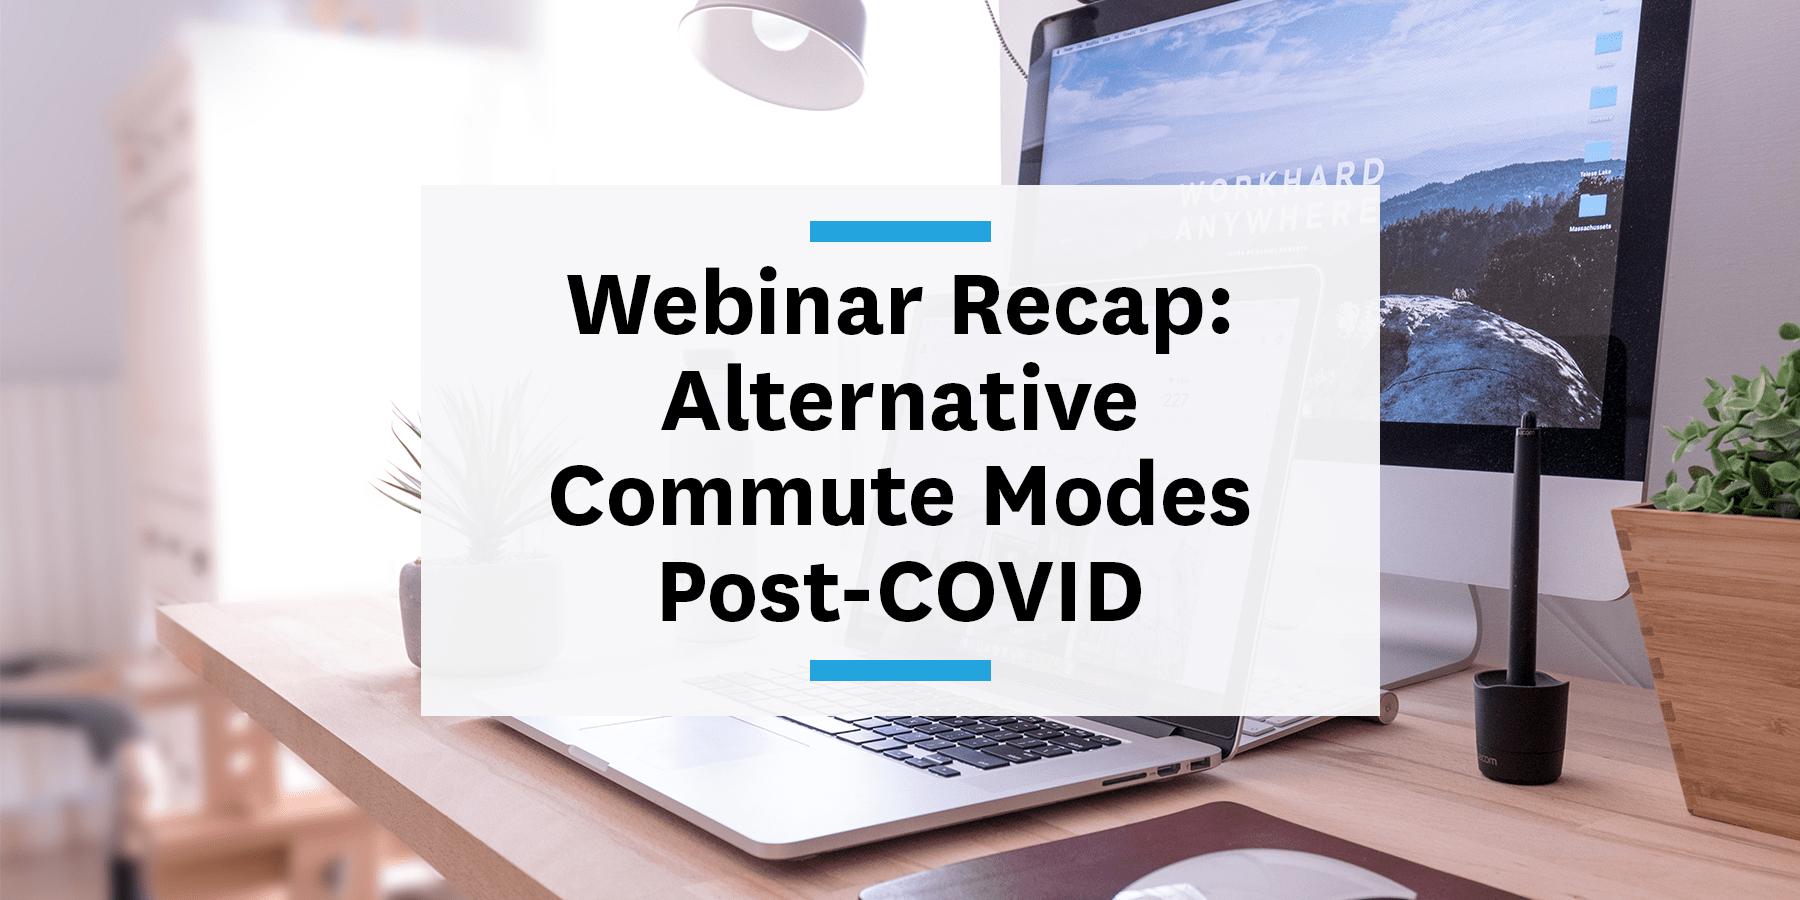 Webinar recap: Alternative commute modes post-COVID